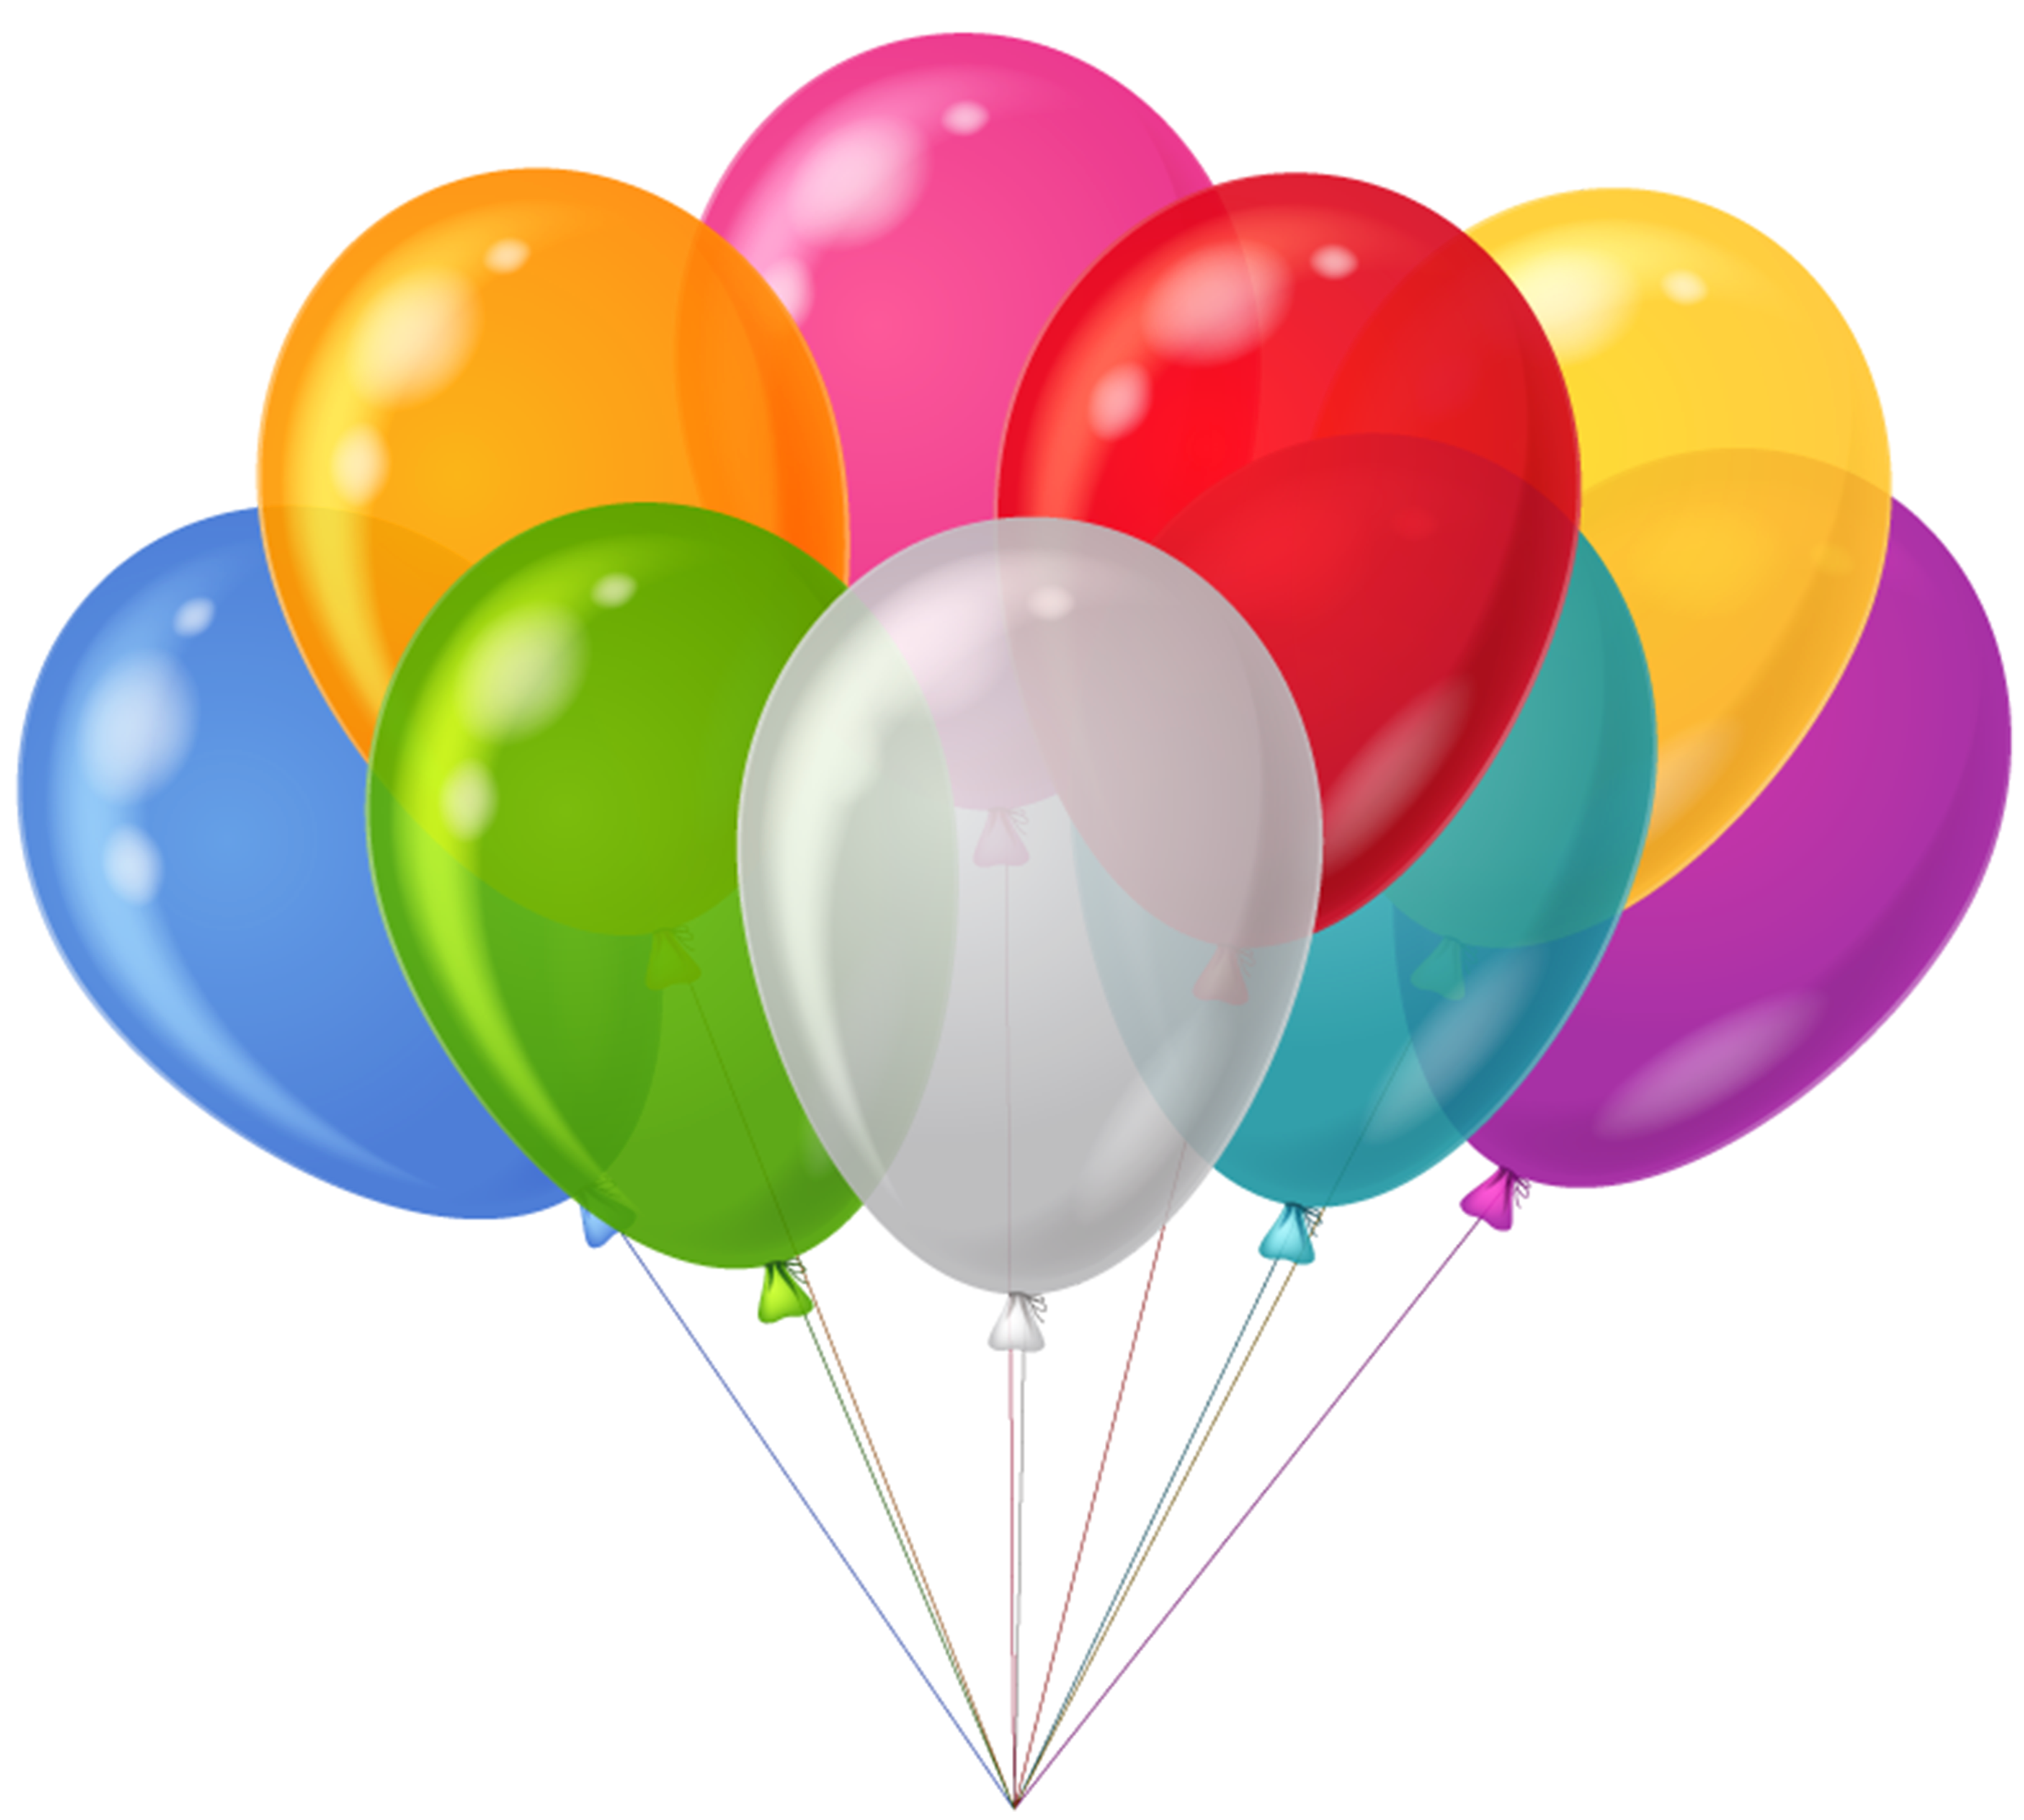 Ballons Clip Art-Ballons Clip Art-3